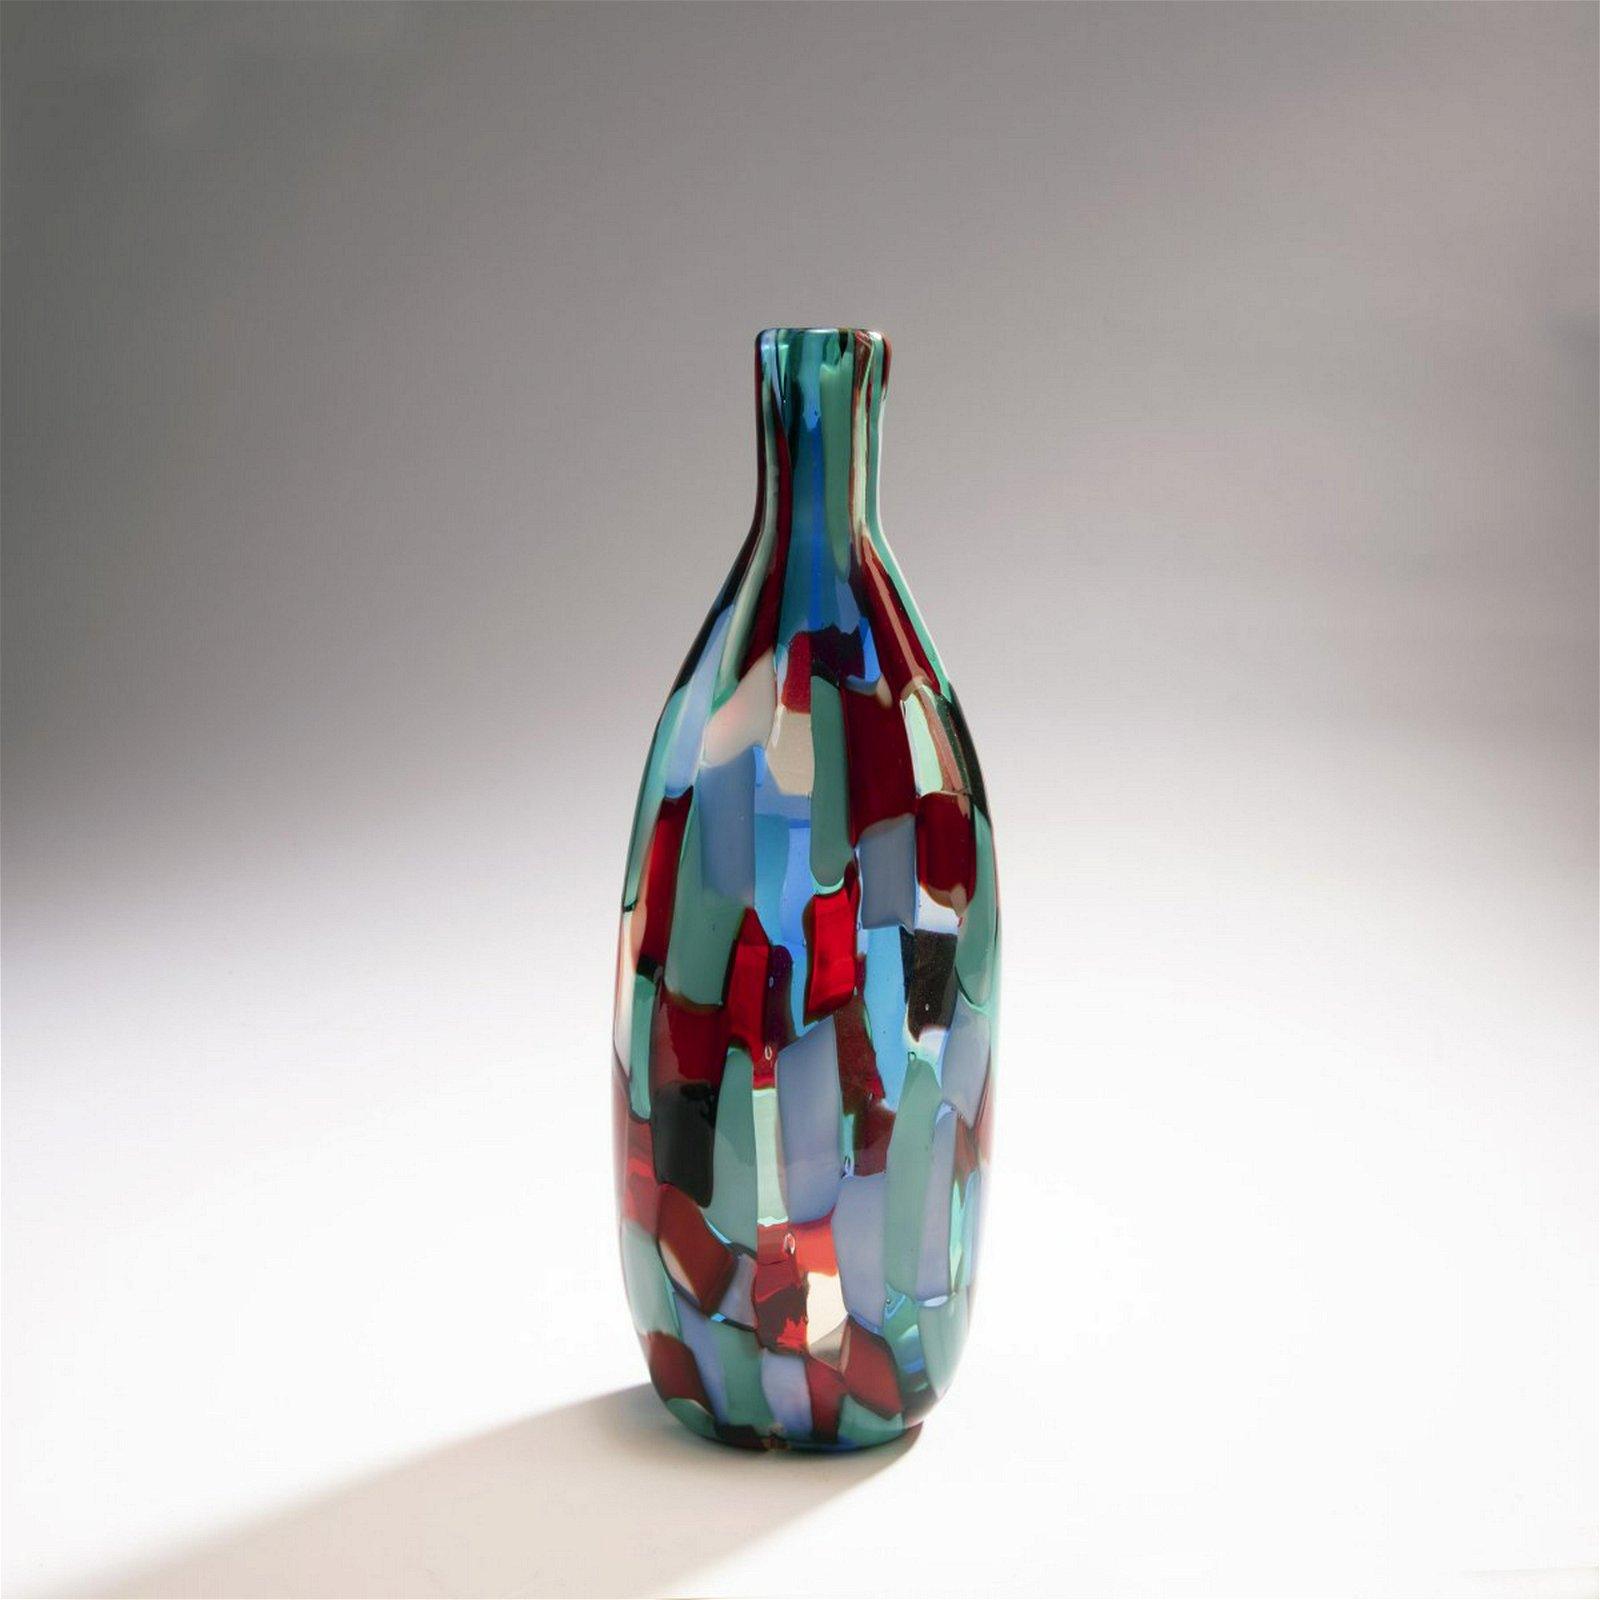 Fulvio Bianconi, Bottle vase 'Pezzato', c. 1950